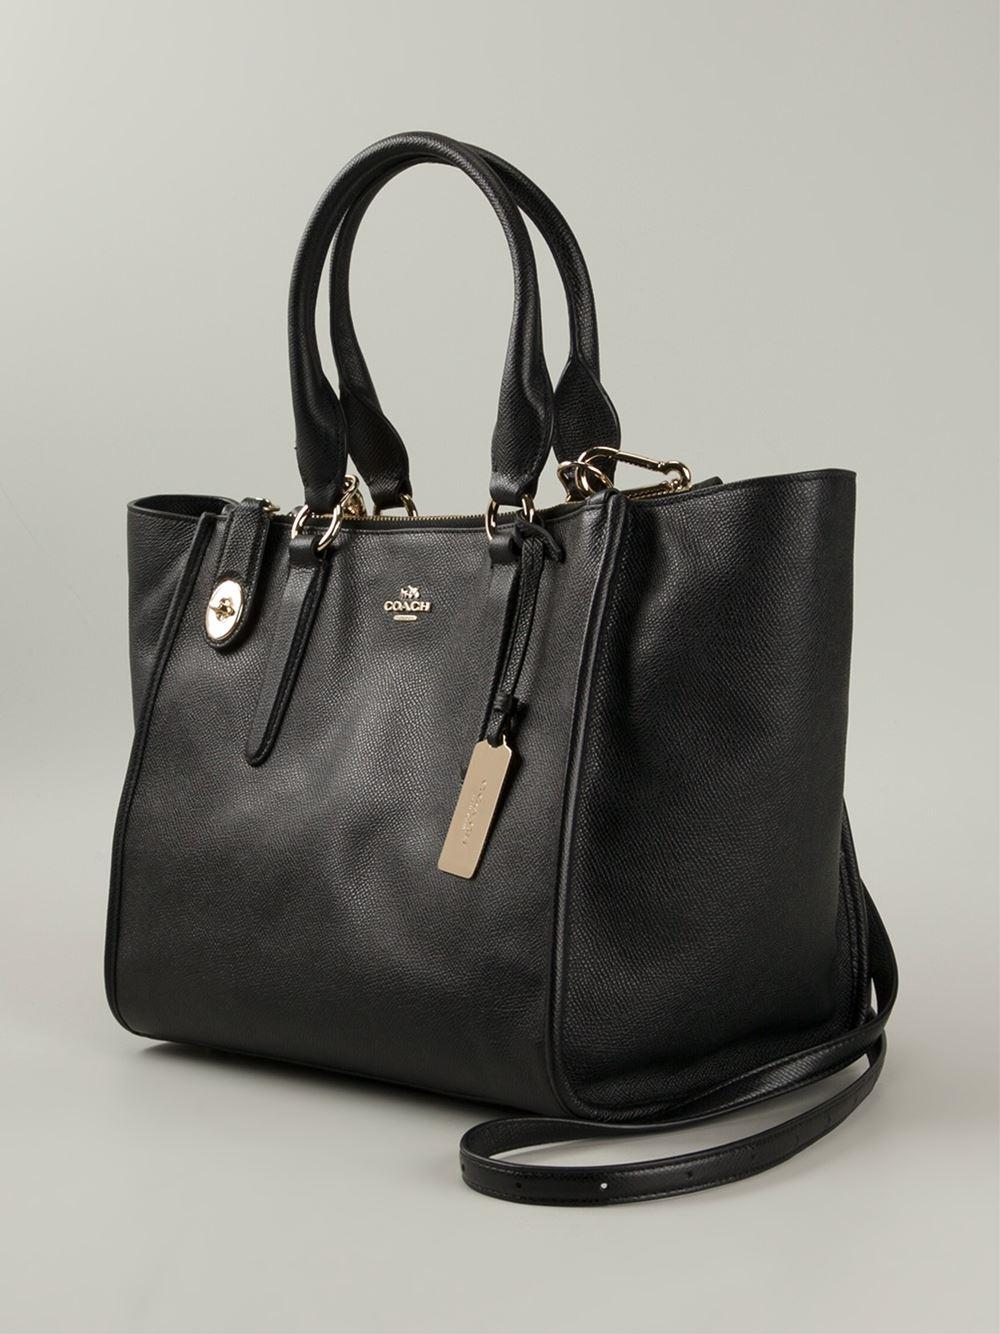 Coach Crosby Leather Shoulder Bag in Black | Lyst